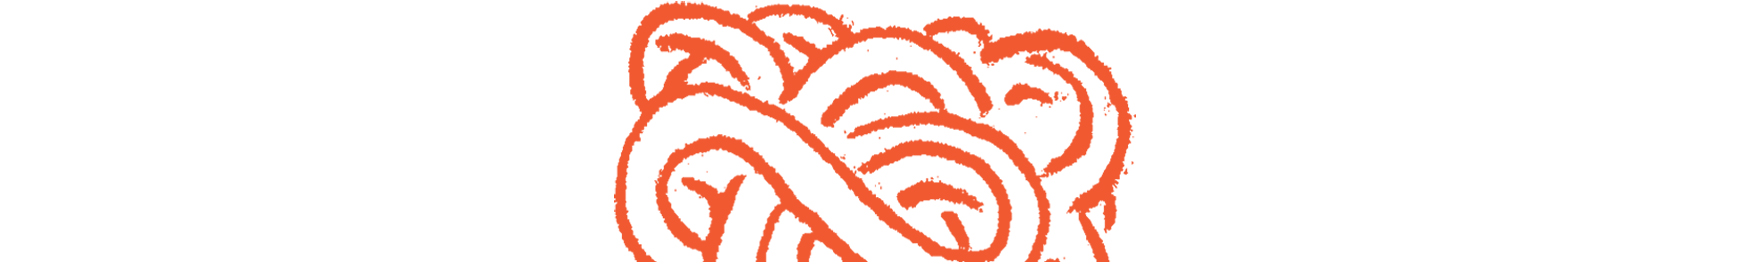 menus-orange.jpg